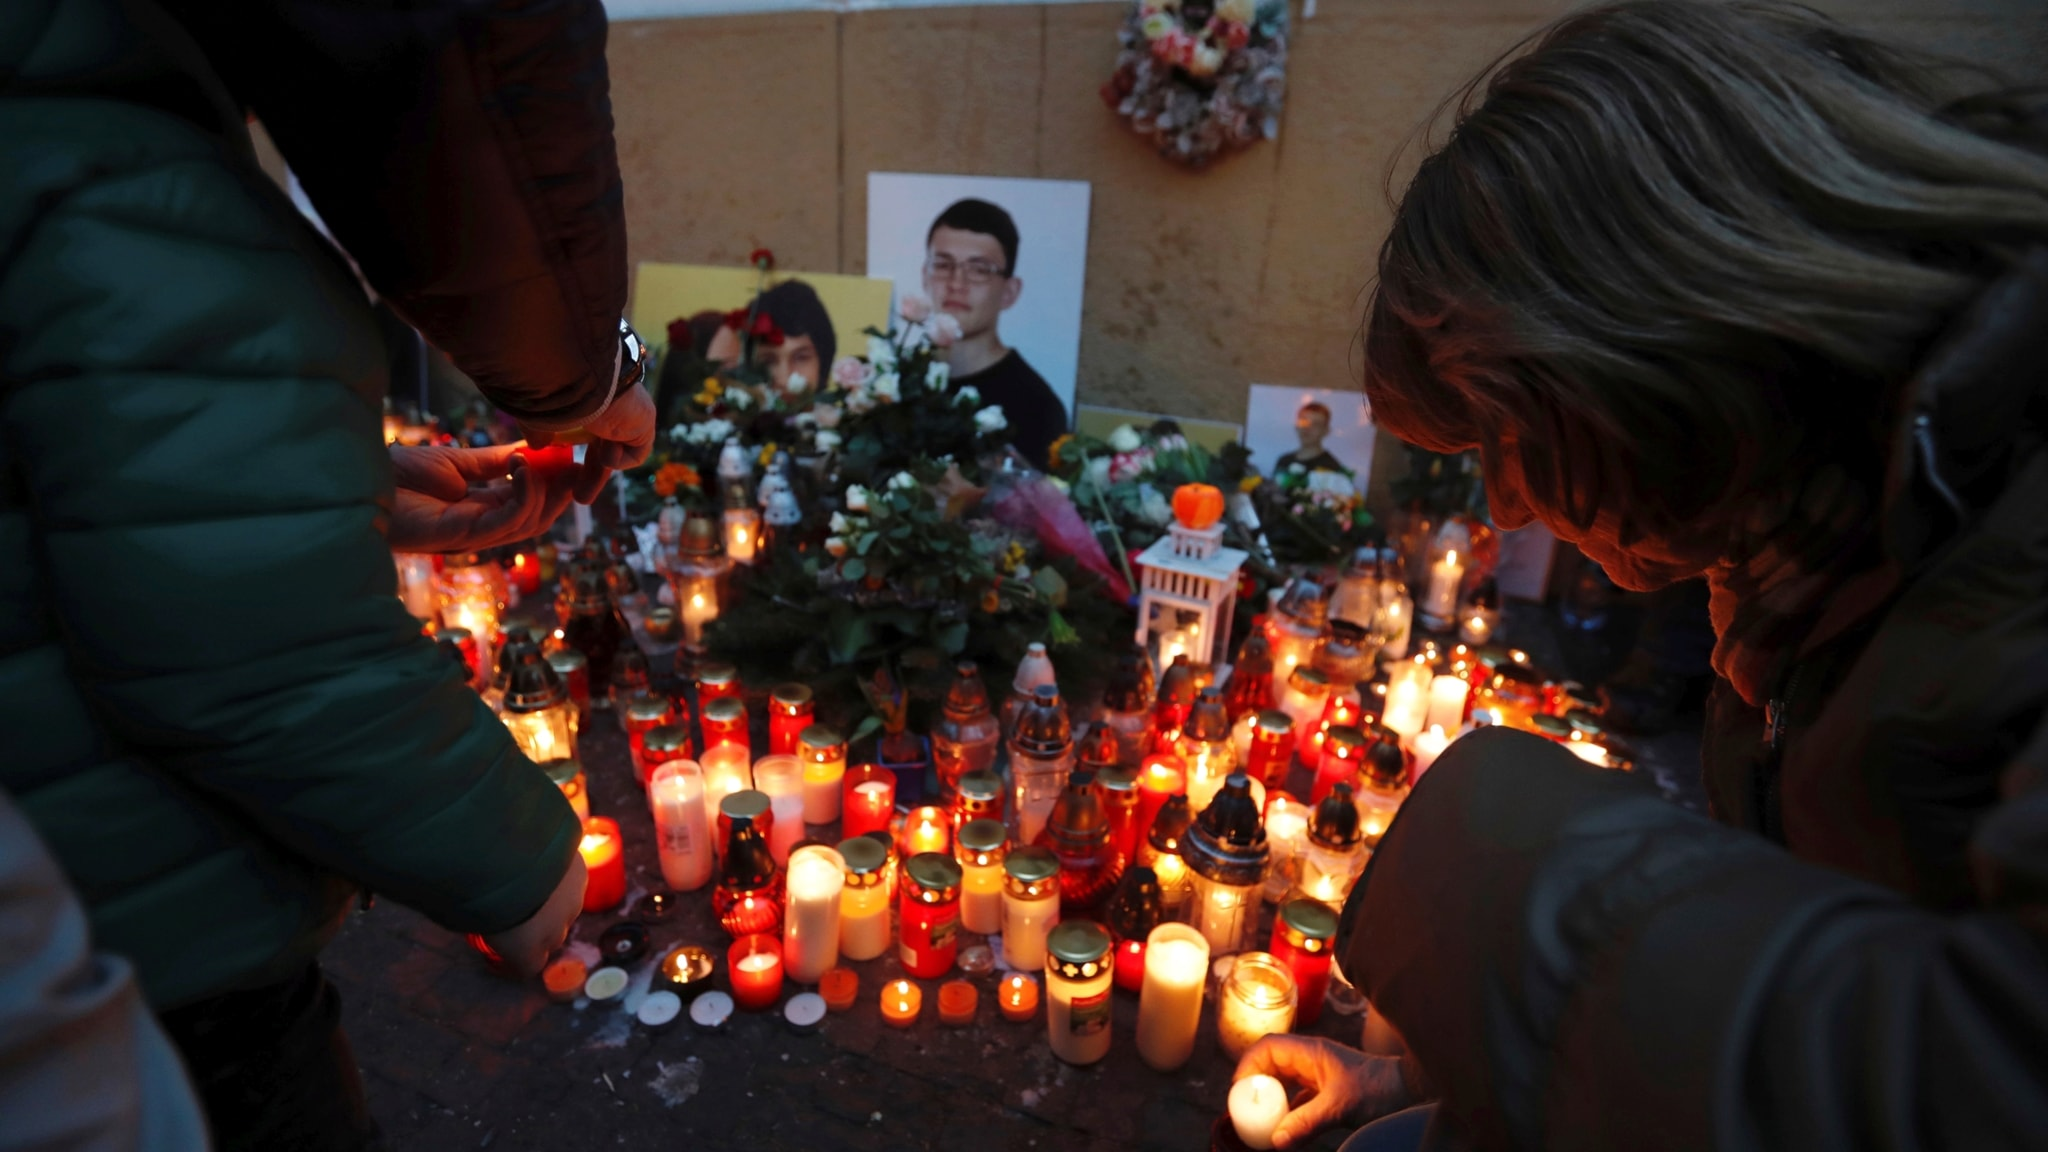 Ljusmanifestation till minne av journalisten Ján Kuciak.